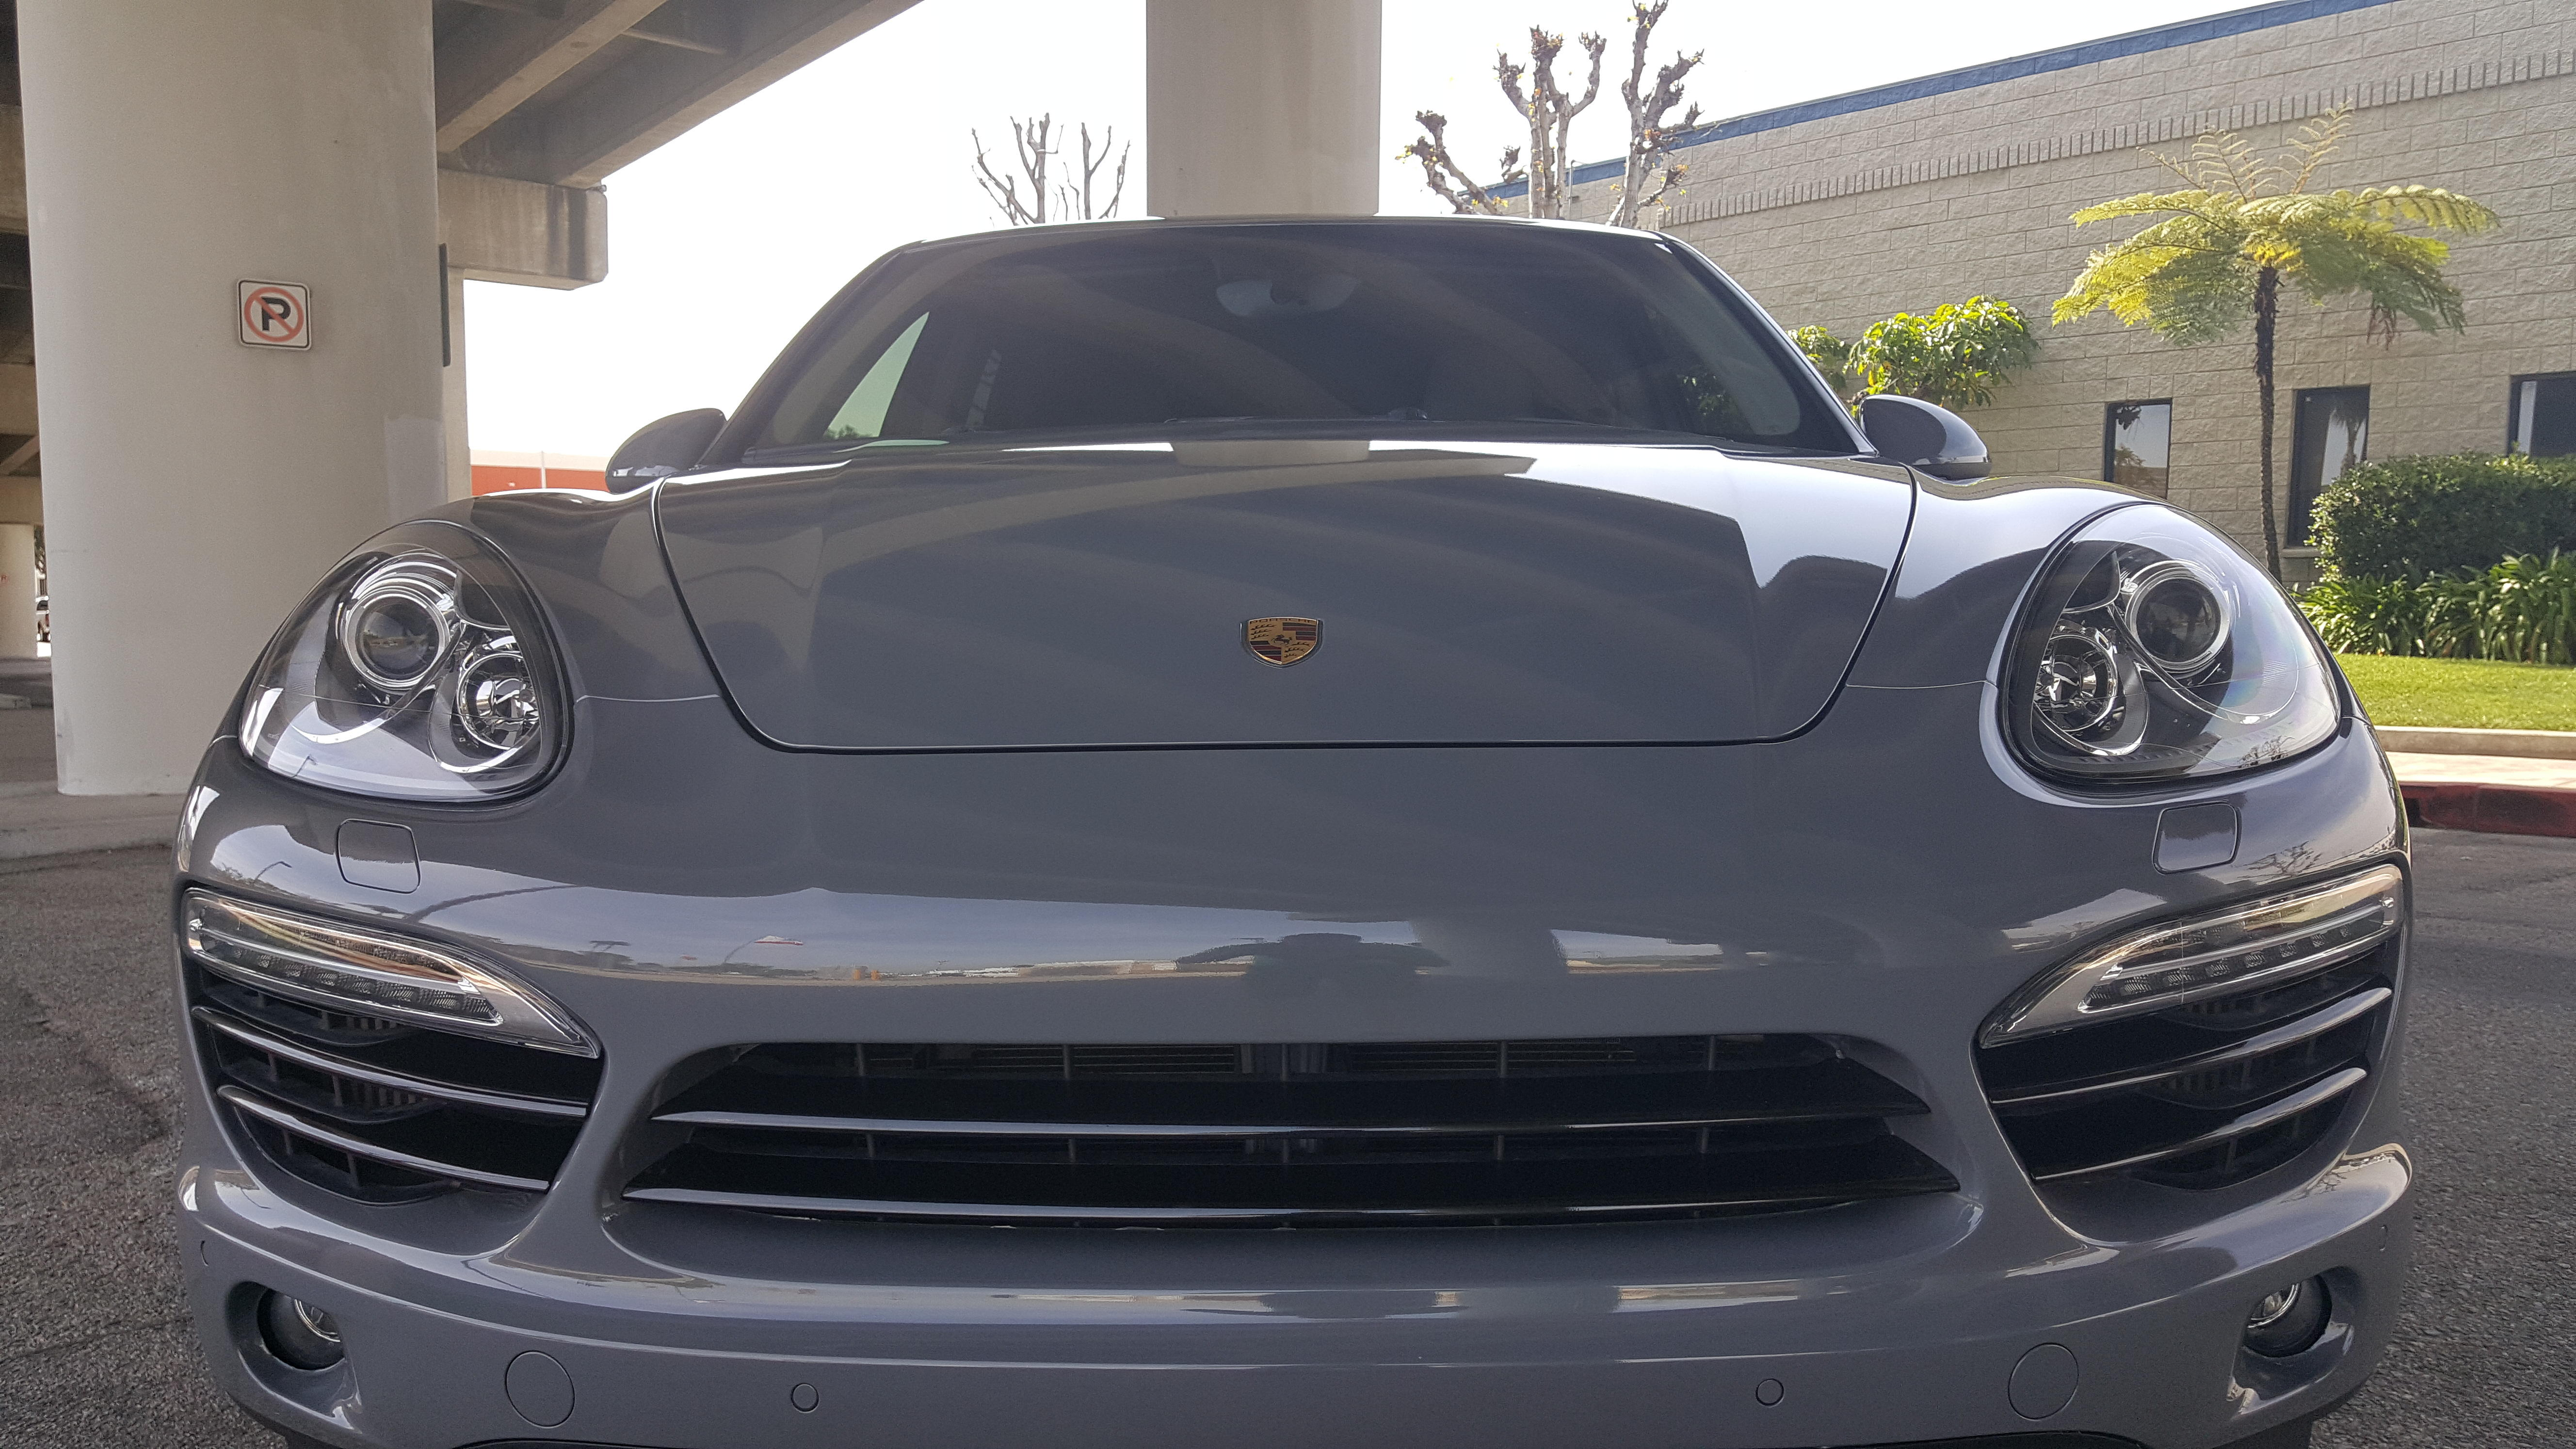 KenPorterAuctionscom  Auto Auctions Los Angeles